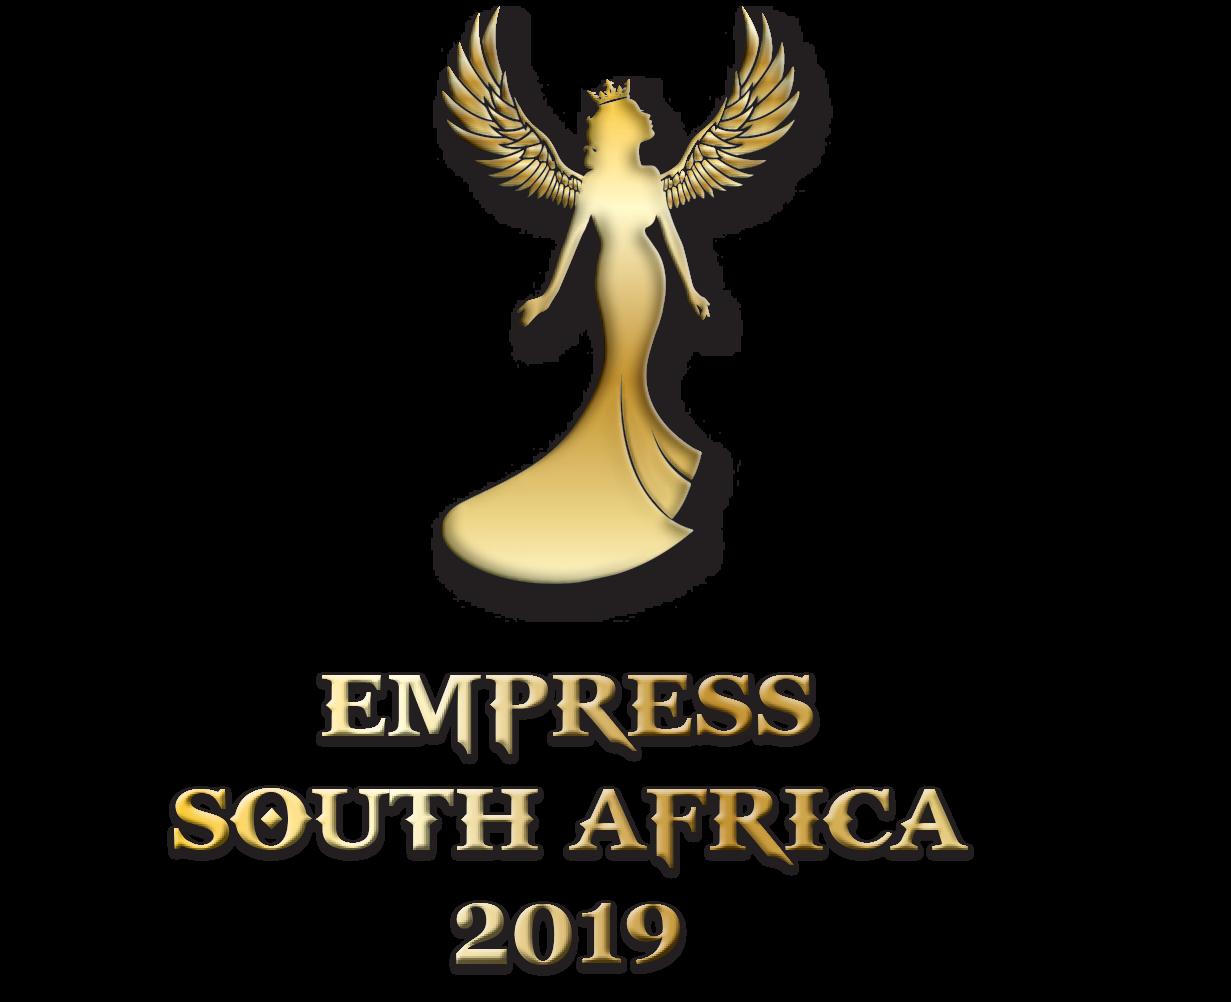 EMPRESS SOUTH AFRICA